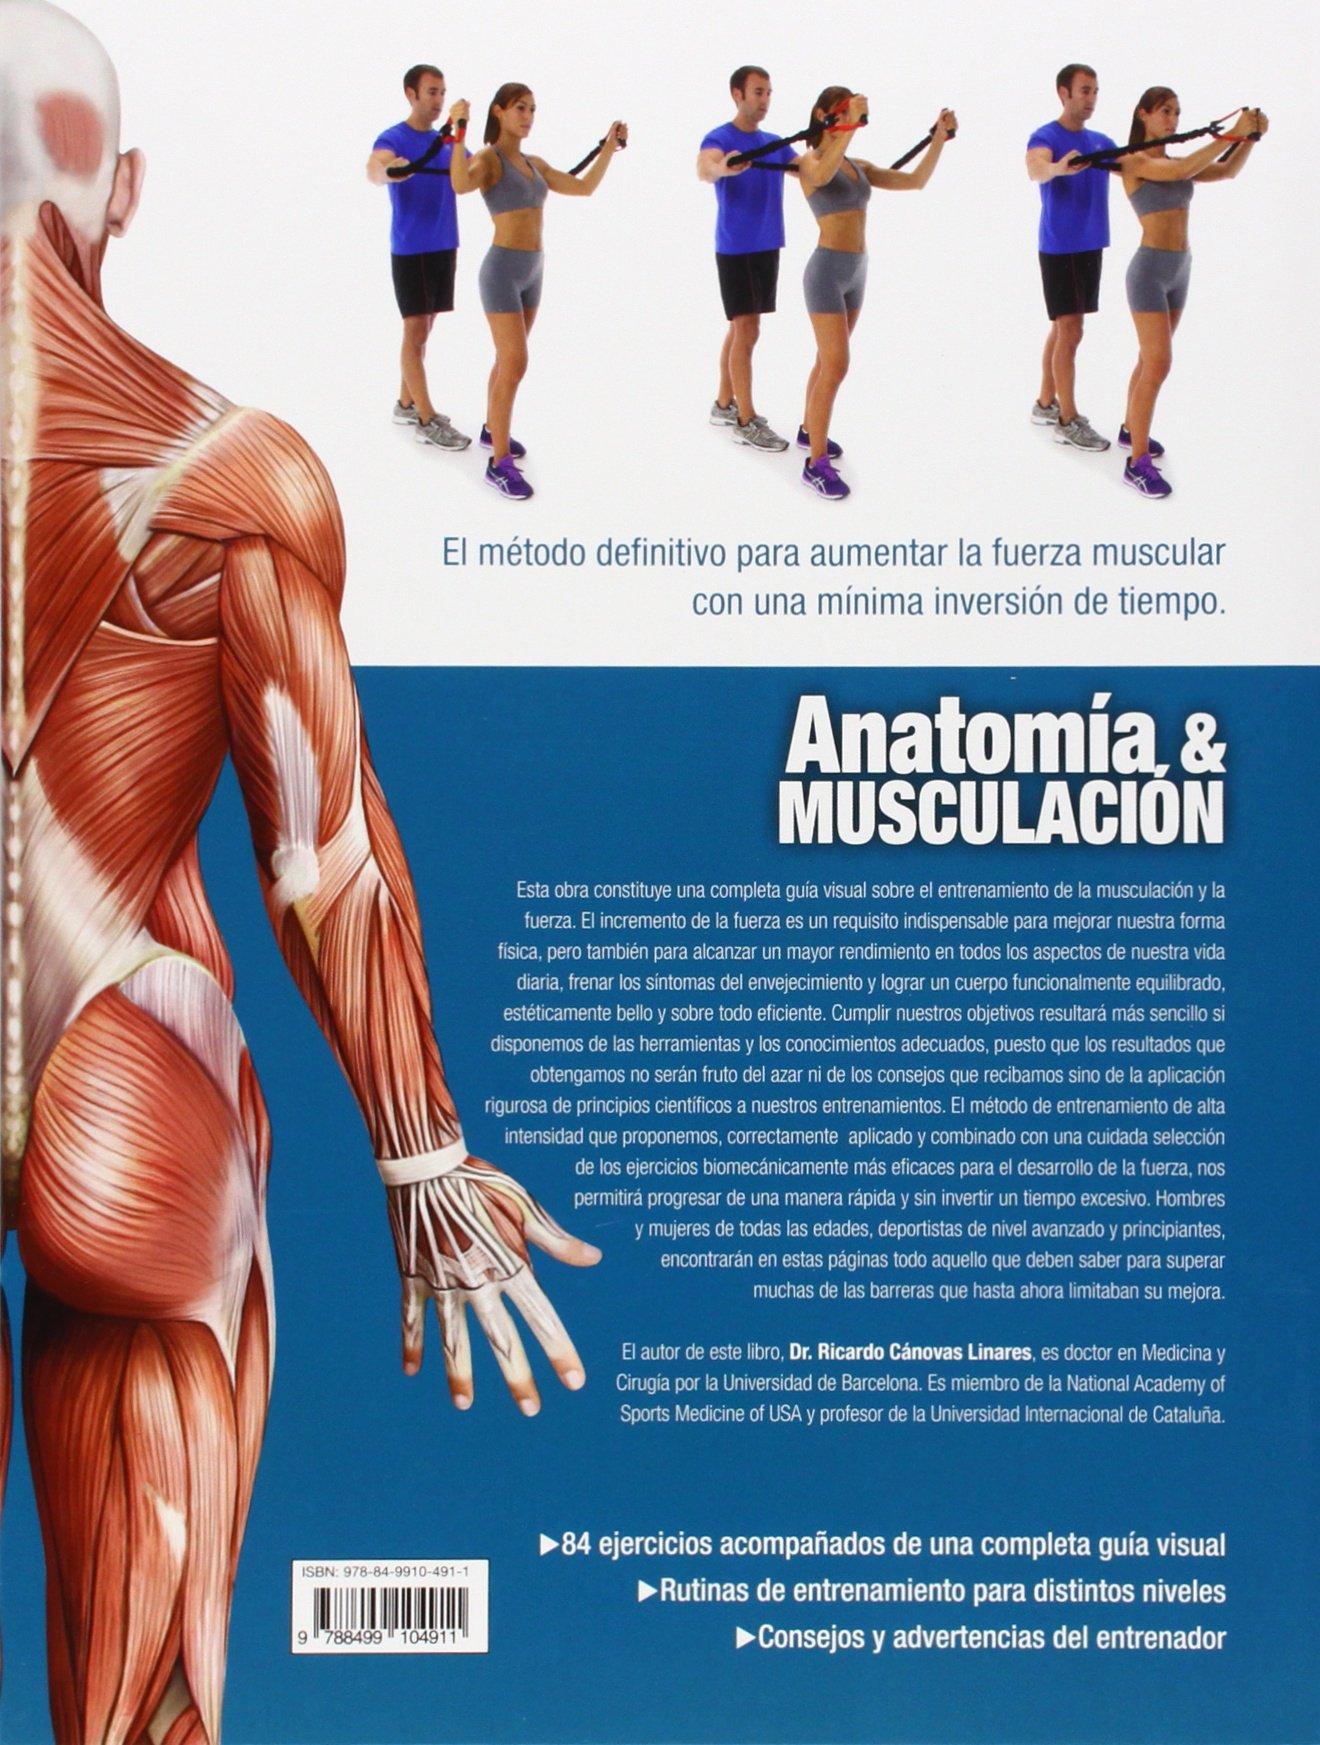 Anatomia y musculacion. Guia visual completa (Spanish Edition): Ricardo Canovas: 9788499104911: Amazon.com: Books